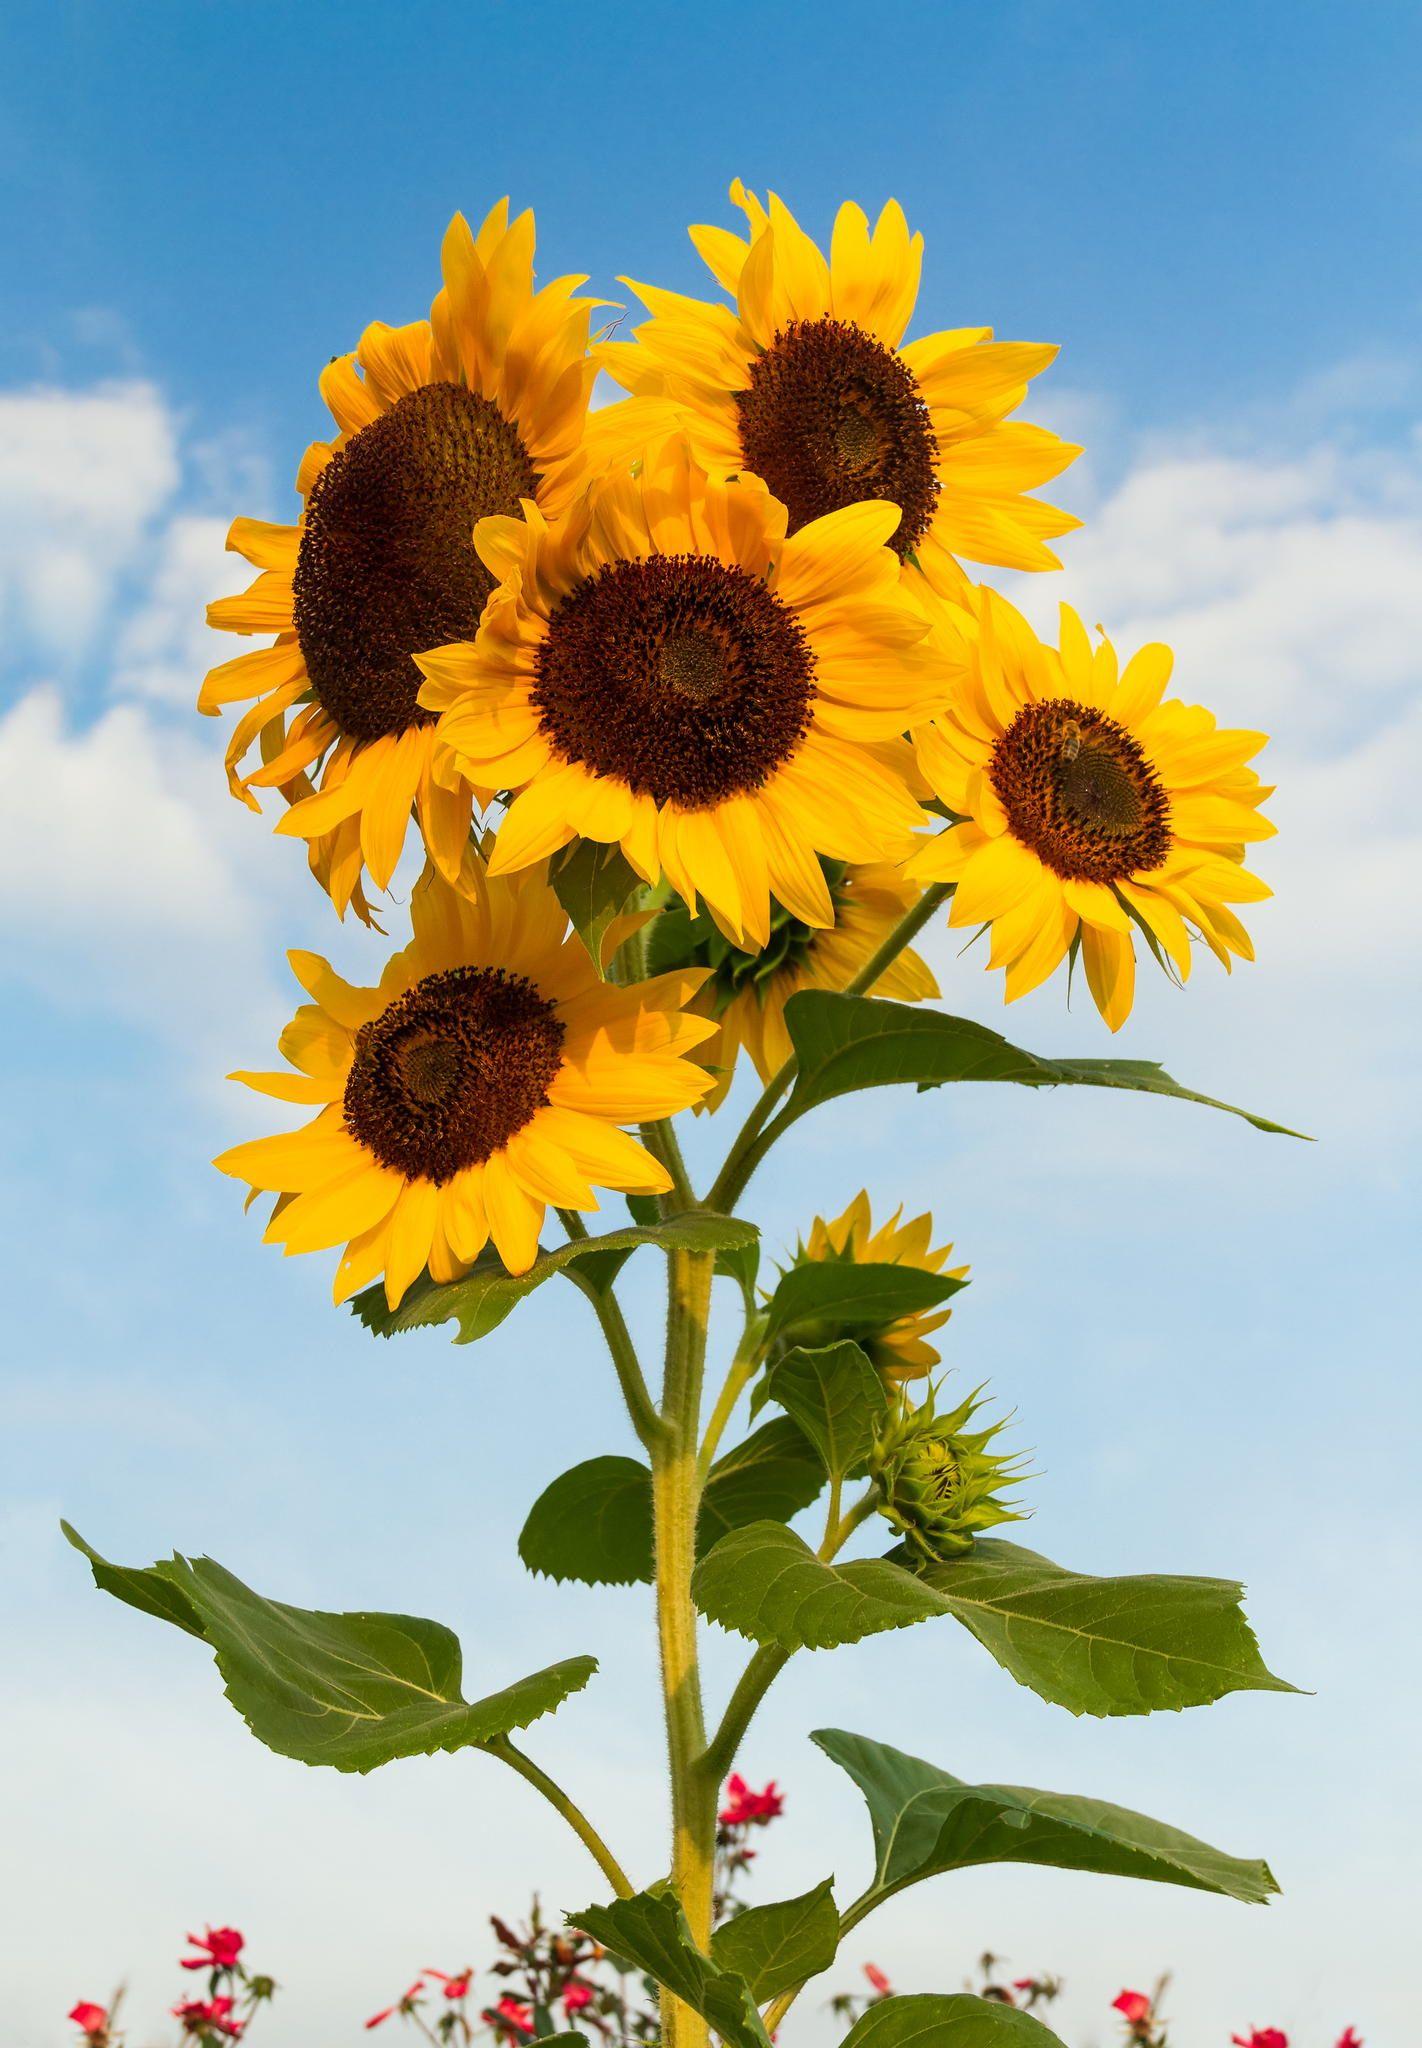 Sunflower Cluster Beautiful sunflowers bloom standing